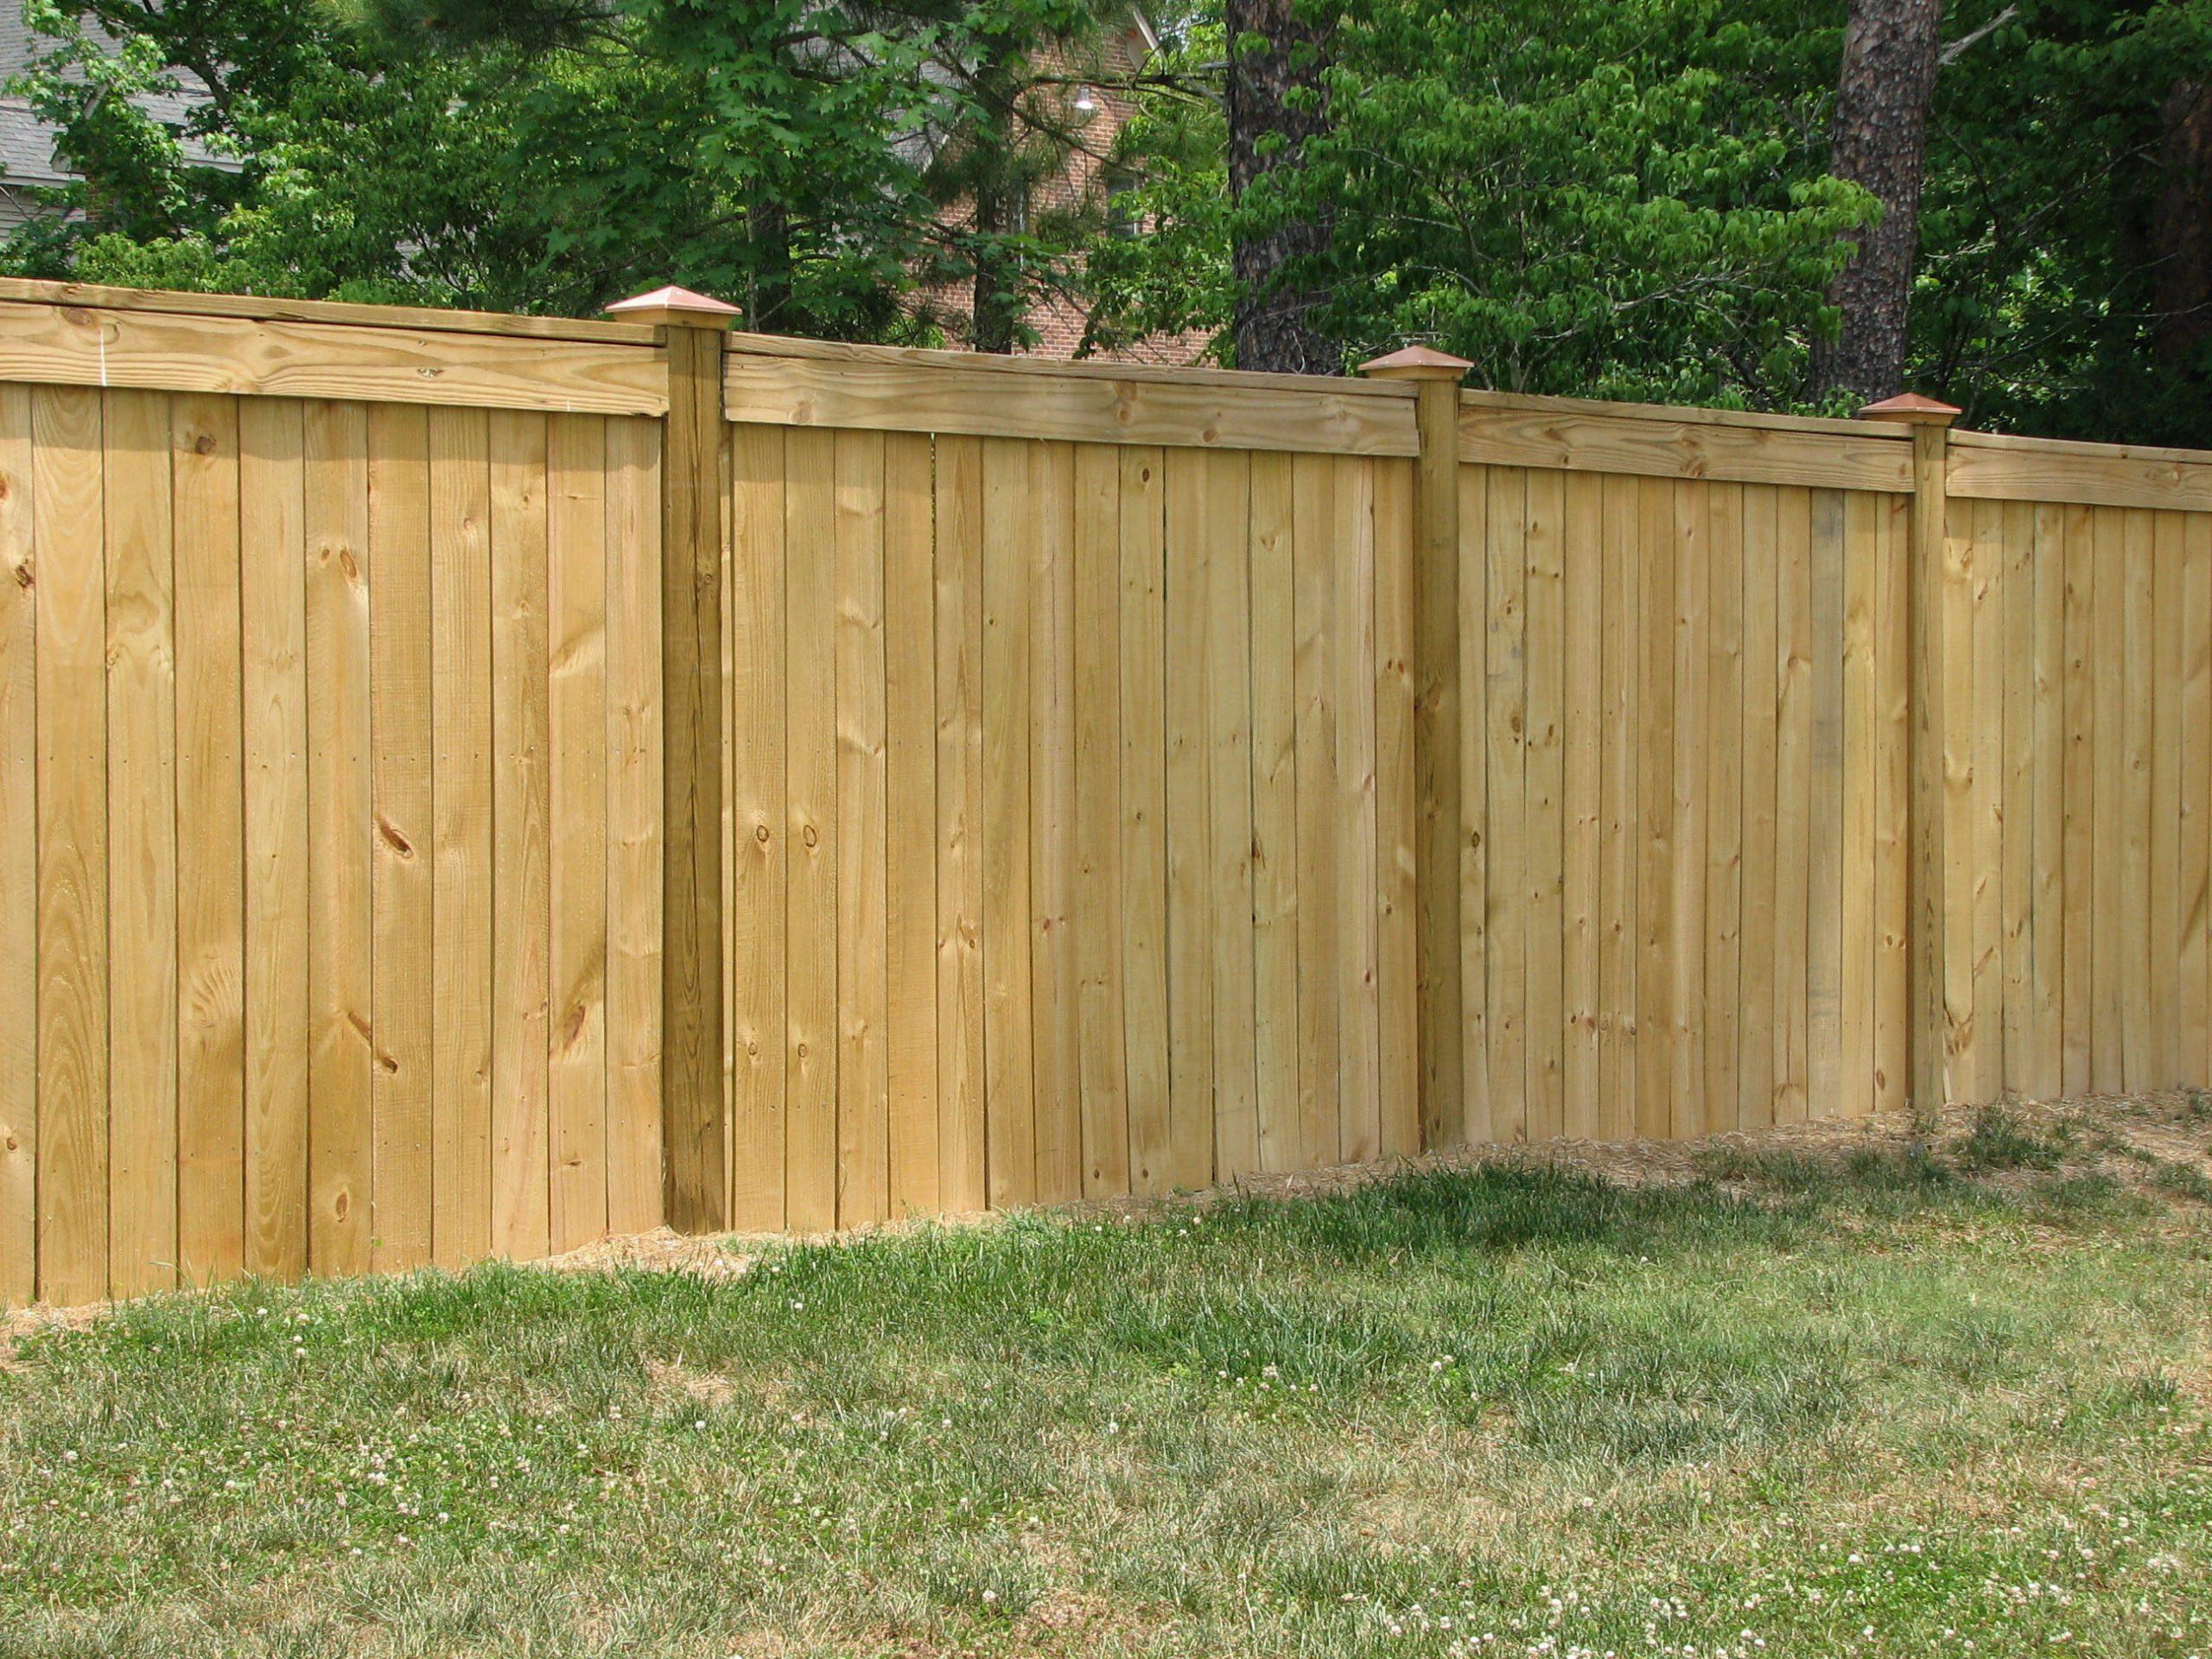 Simphome.com inexpensive dog fence ideas elegant backyard dog fence and cheap